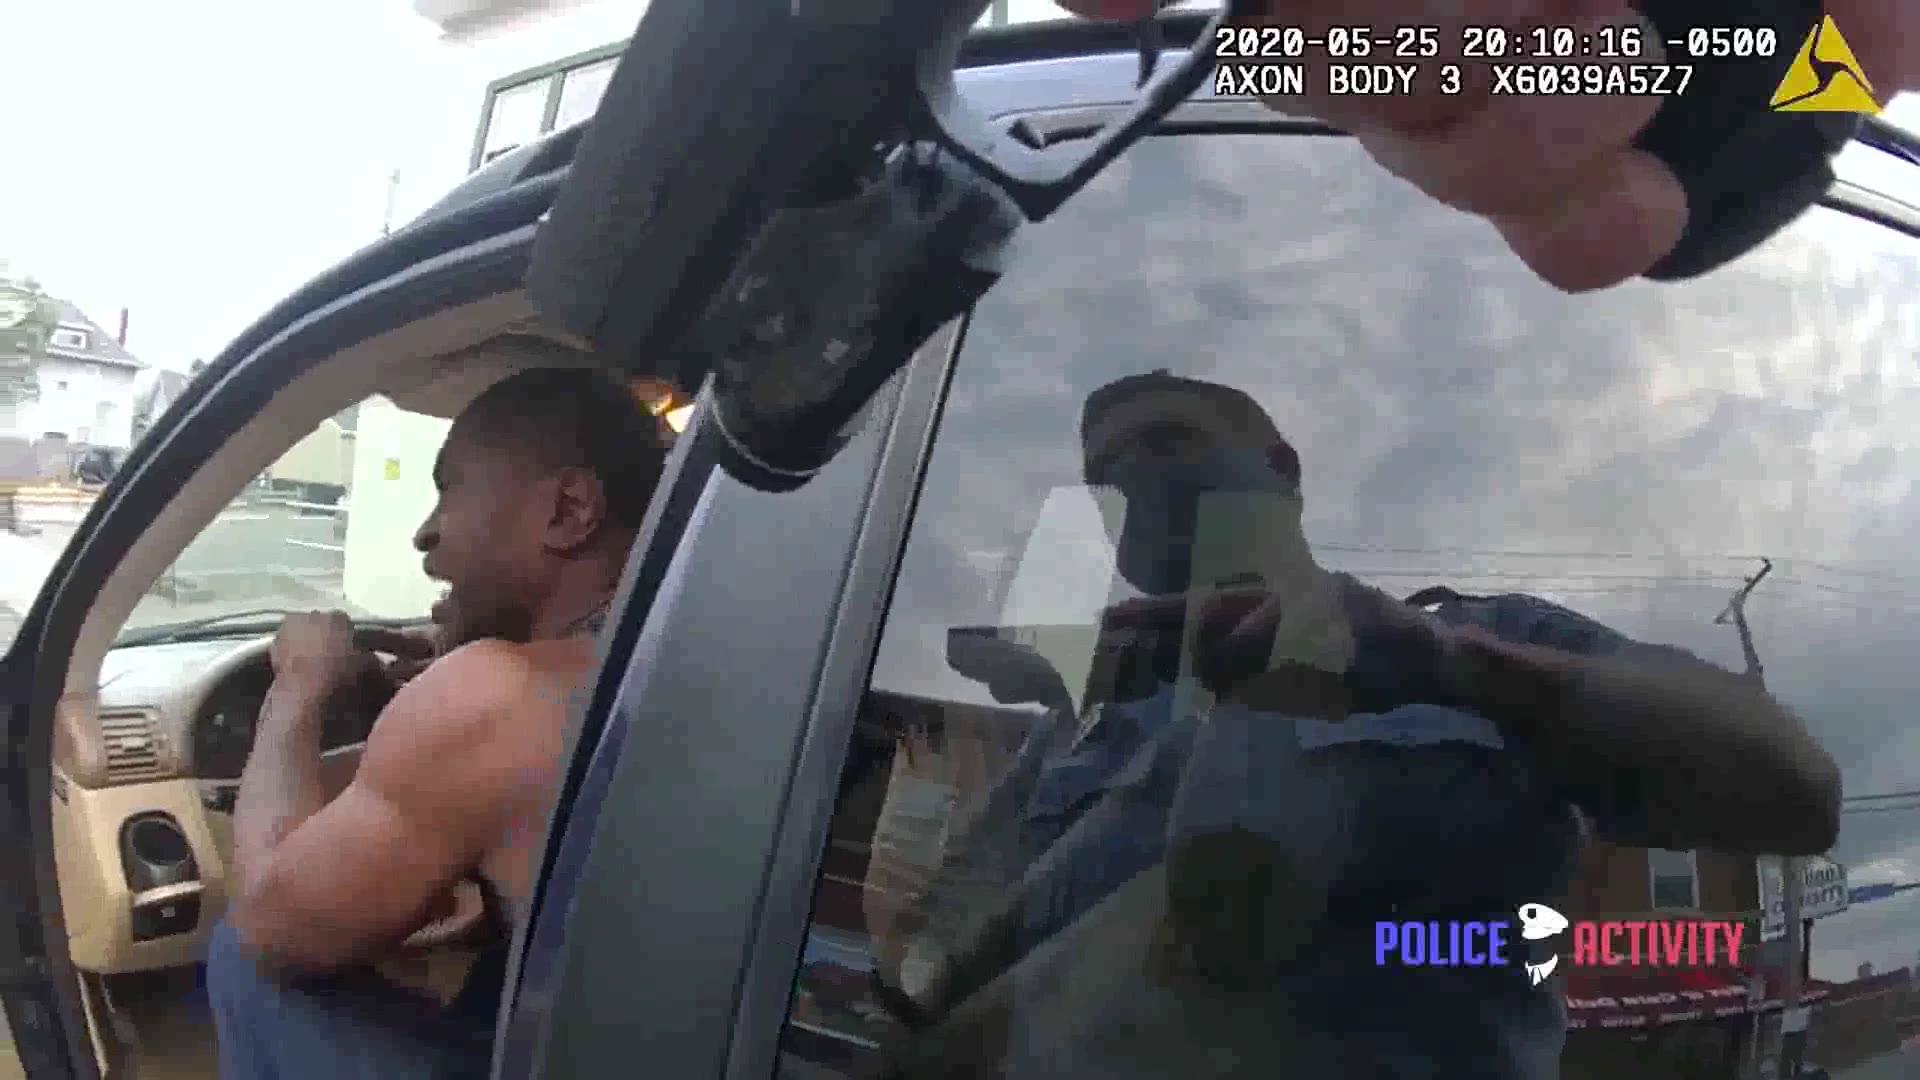 【I CAN T BREATHE!】美国警察执法录像:乔治·弗洛伊德被逮捕至被跪压致死全过程